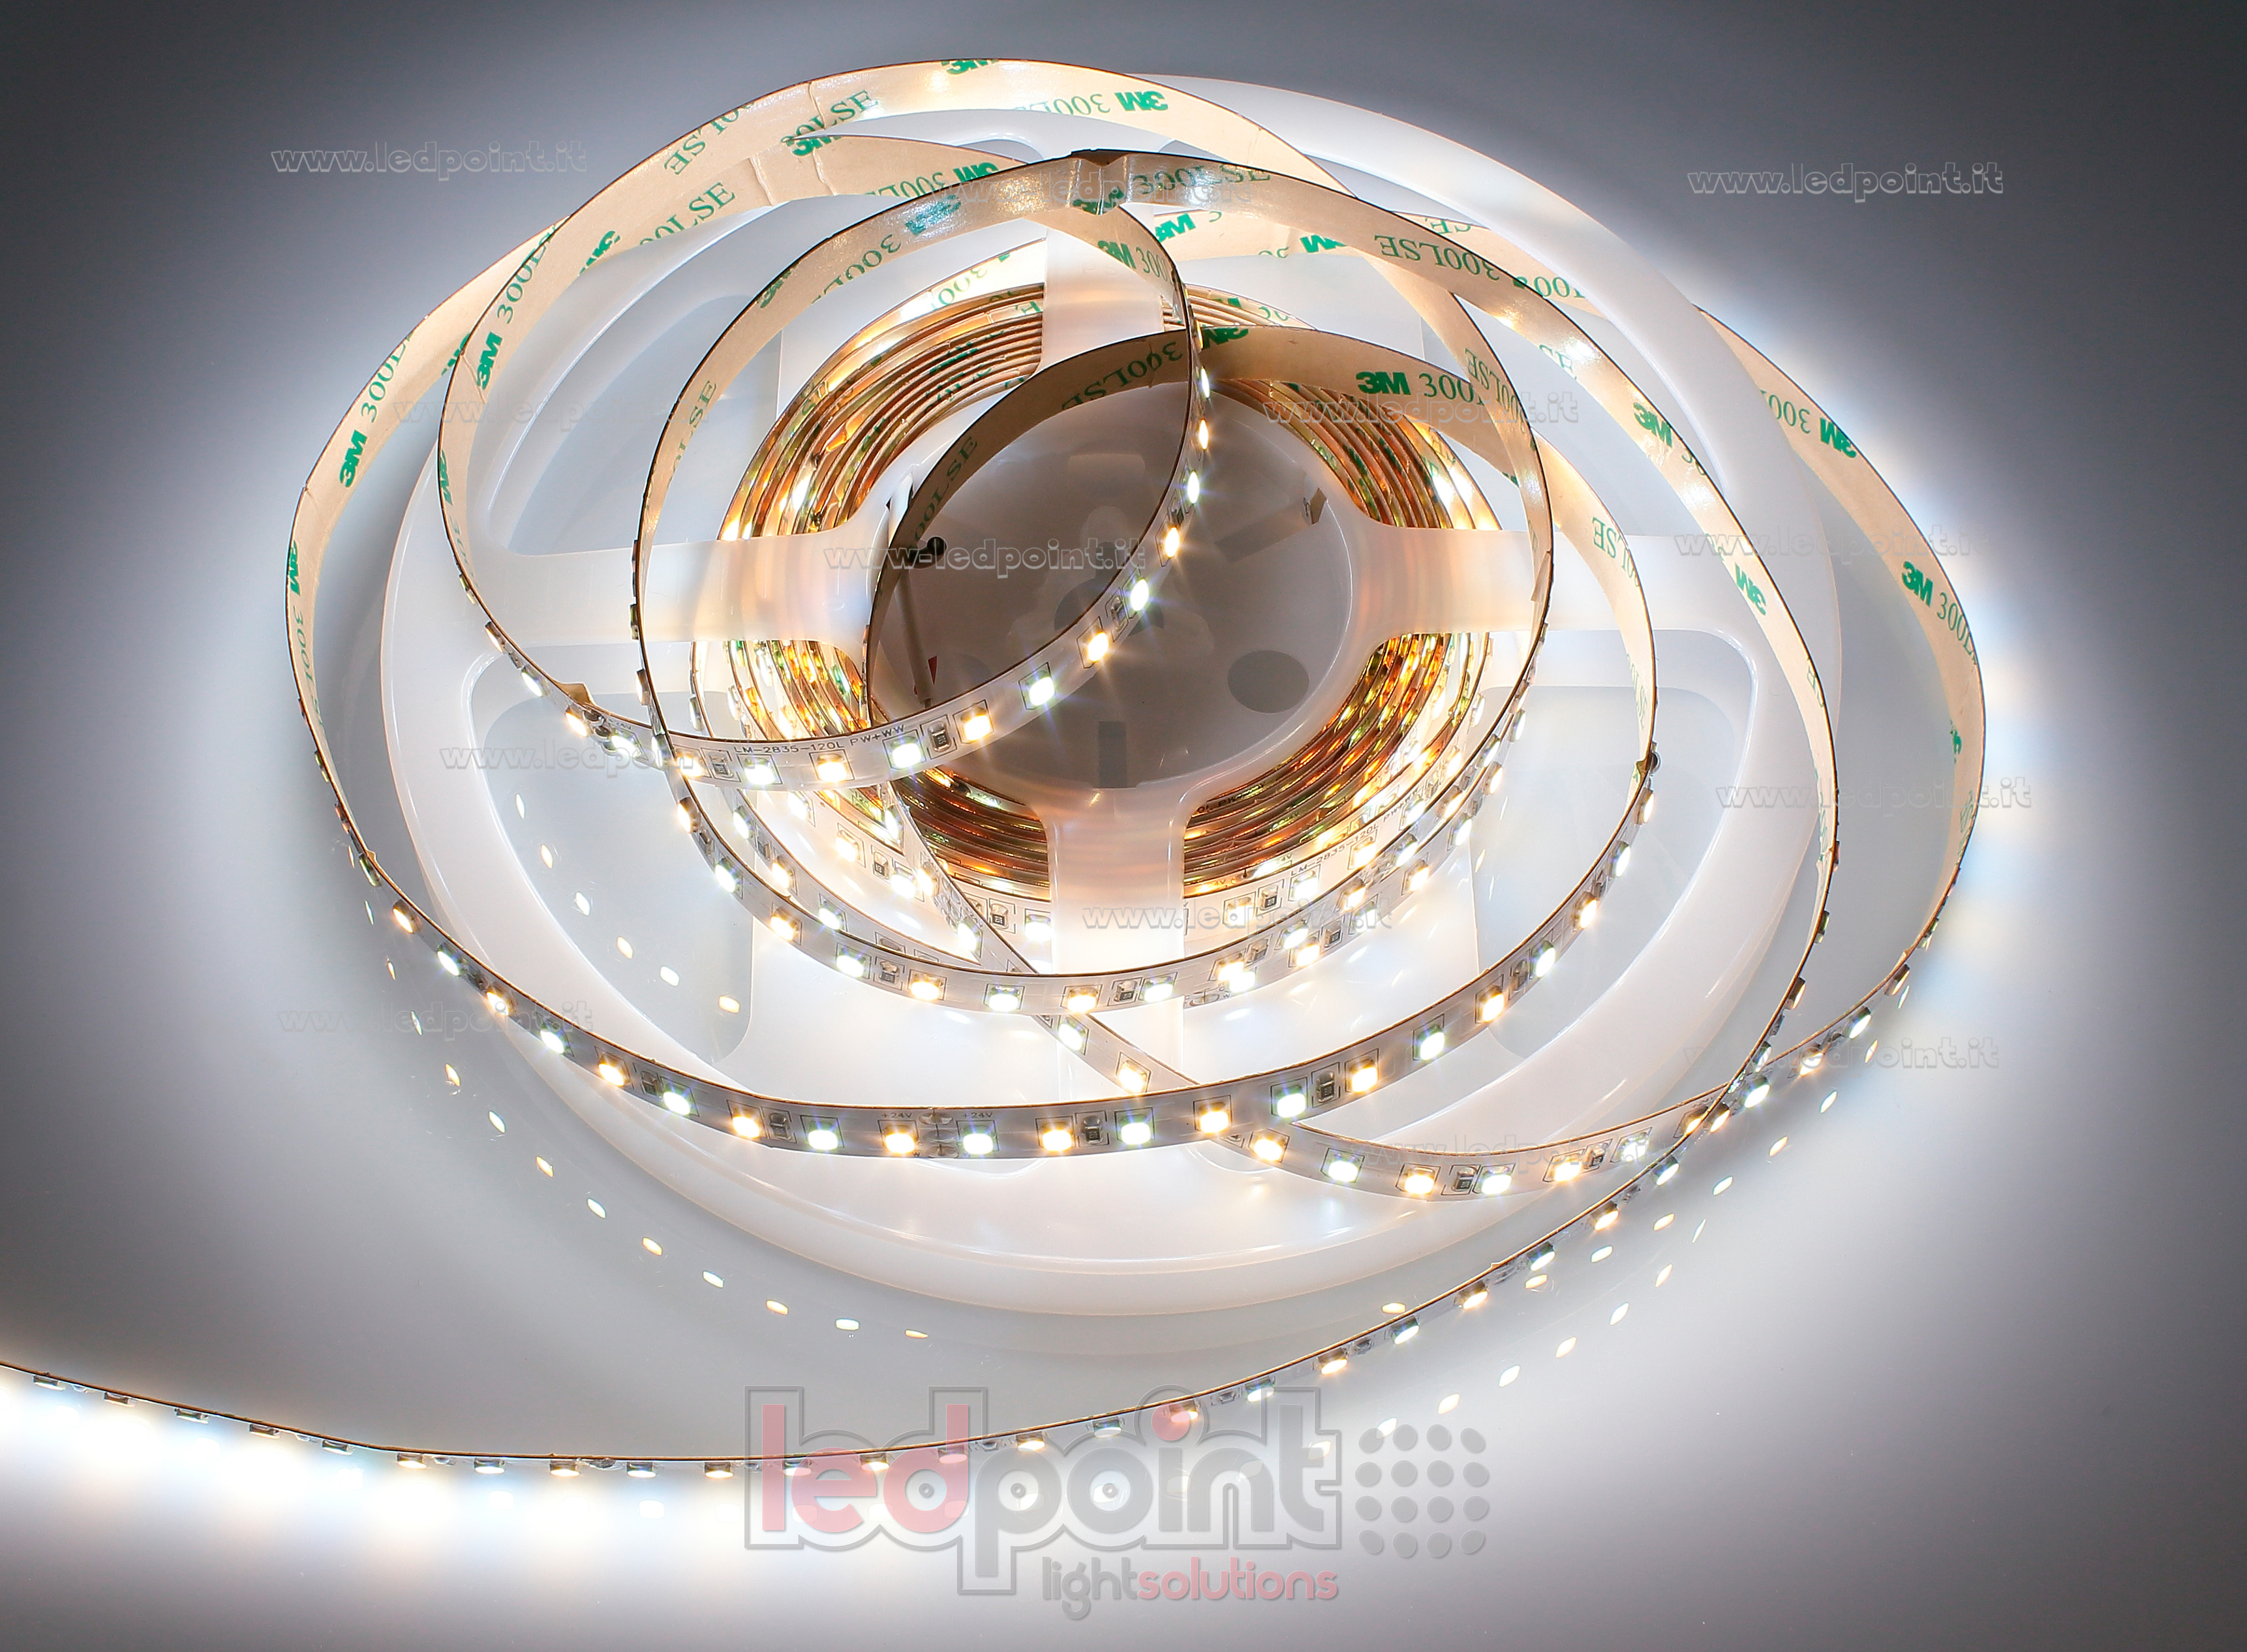 cct led strip 5m 2600 6500k 120leds m honglitronic 2835 24v ledpoint s r l. Black Bedroom Furniture Sets. Home Design Ideas